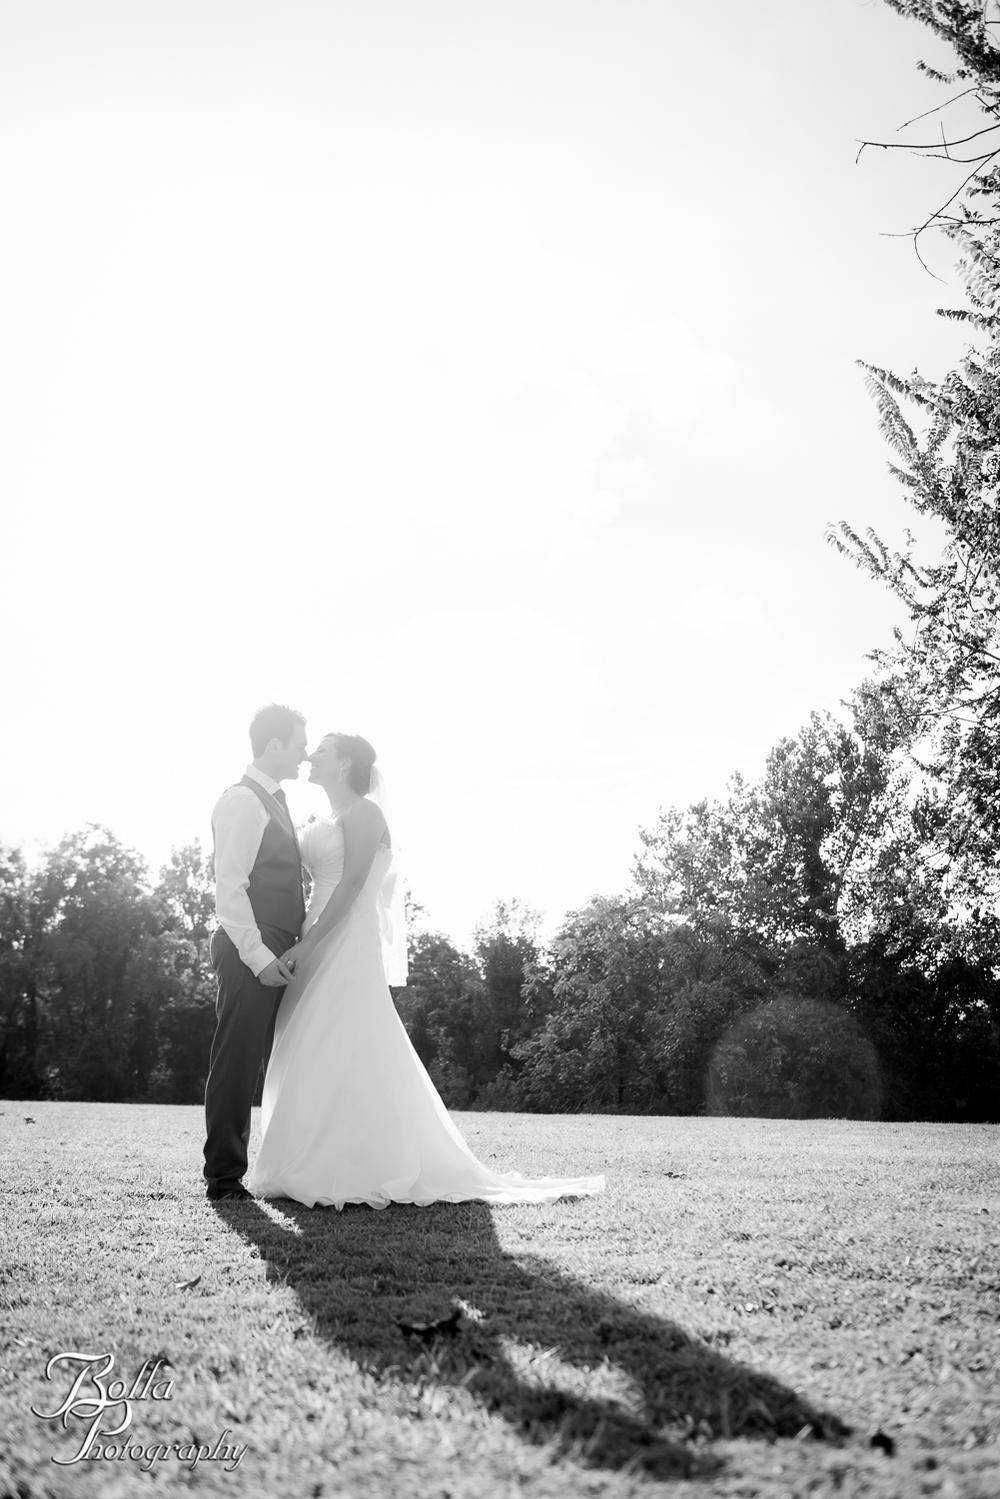 Bolla_Photography_St_Louis_wedding_photographer-0355.jpg